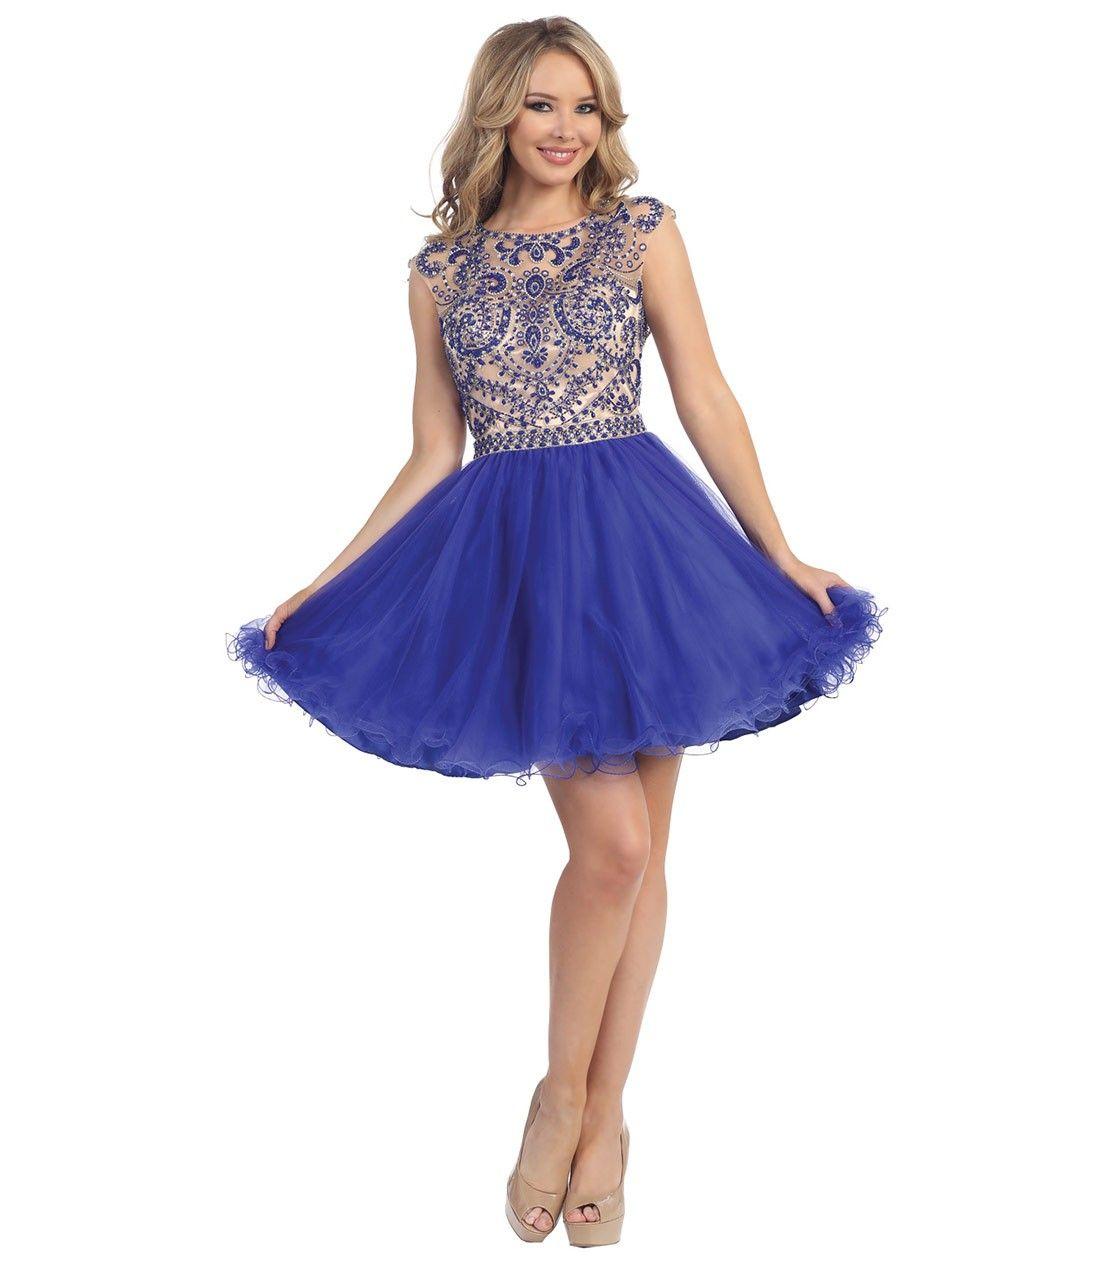 Royal Blue & Nude Sheer Embellished Open Back Beaded Dress | Gala ...